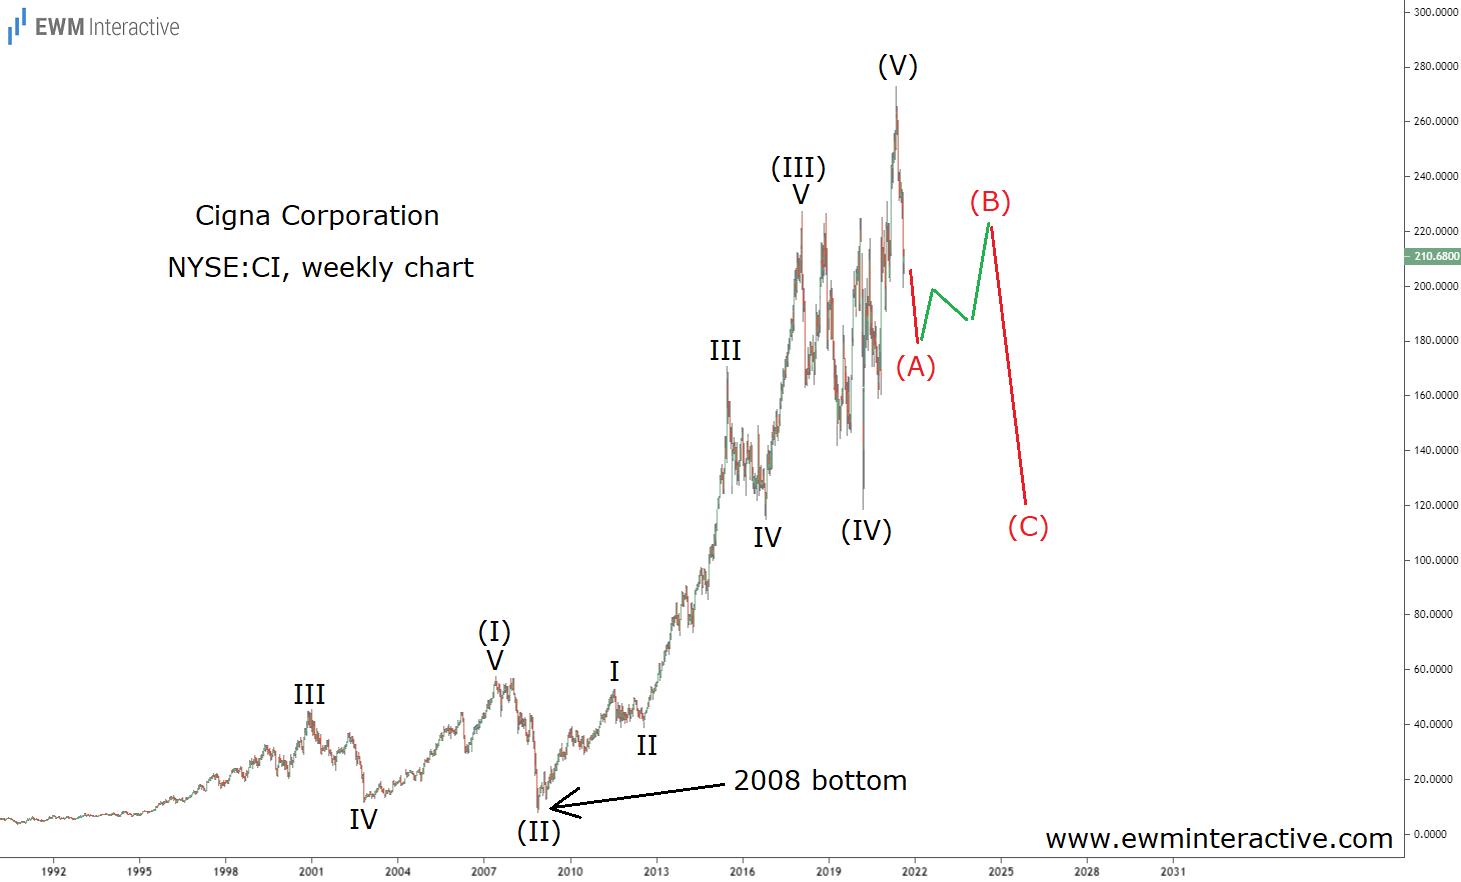 Cigna stock chart once again sending a bearish message